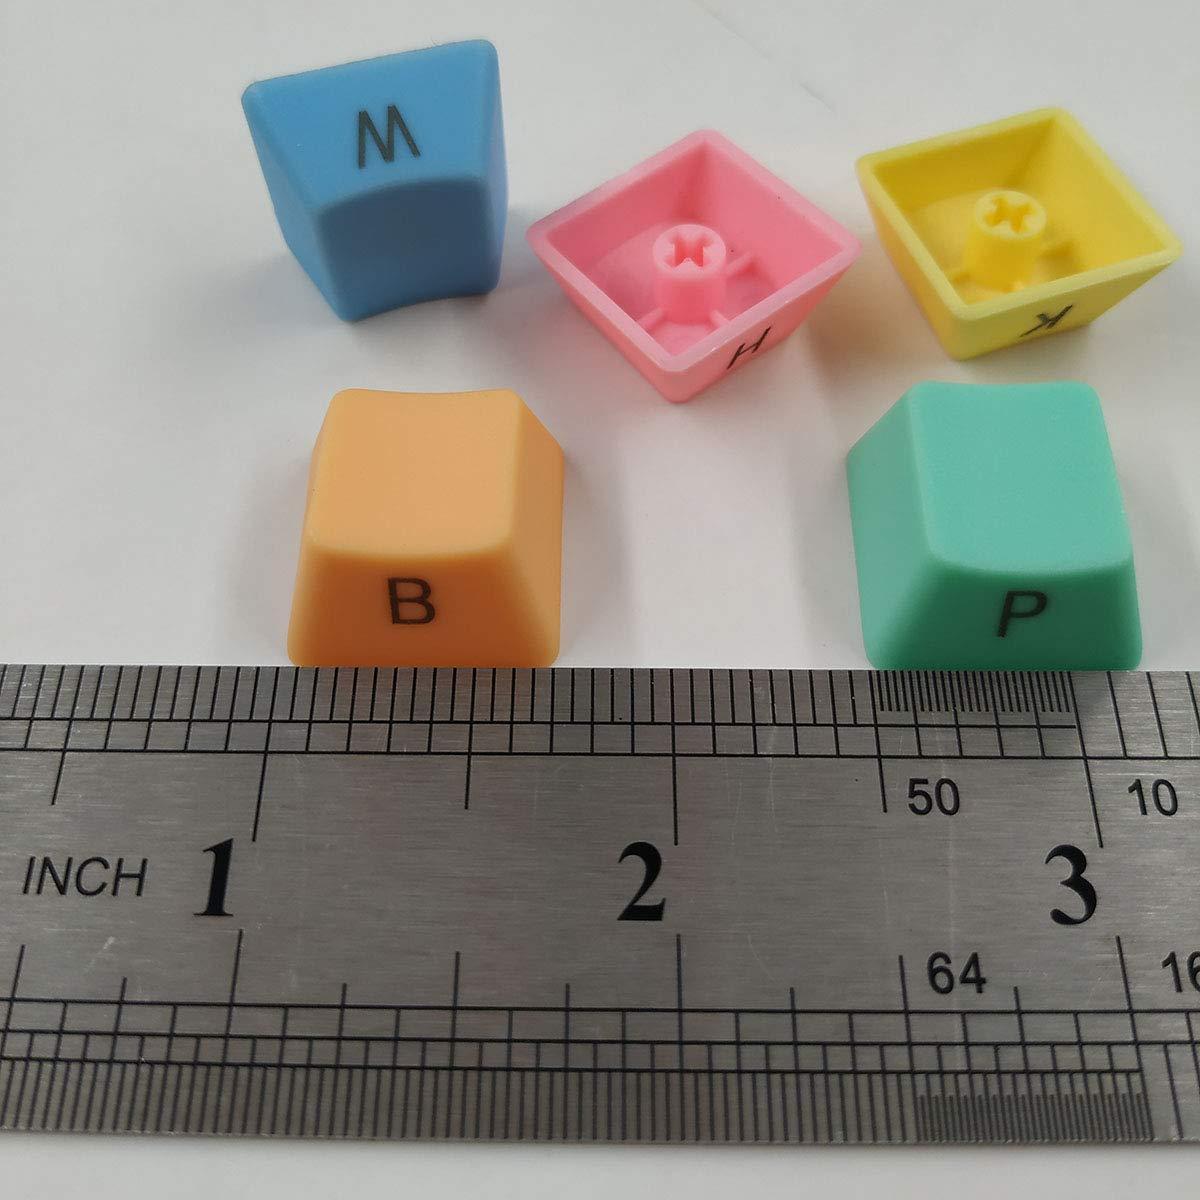 BestwayTech 37key PBT Keycaps Double Shot Injection Backlight Keycaps per Tastiera con Interruttore Meccanico Key Puller Rainbow Gradient Color